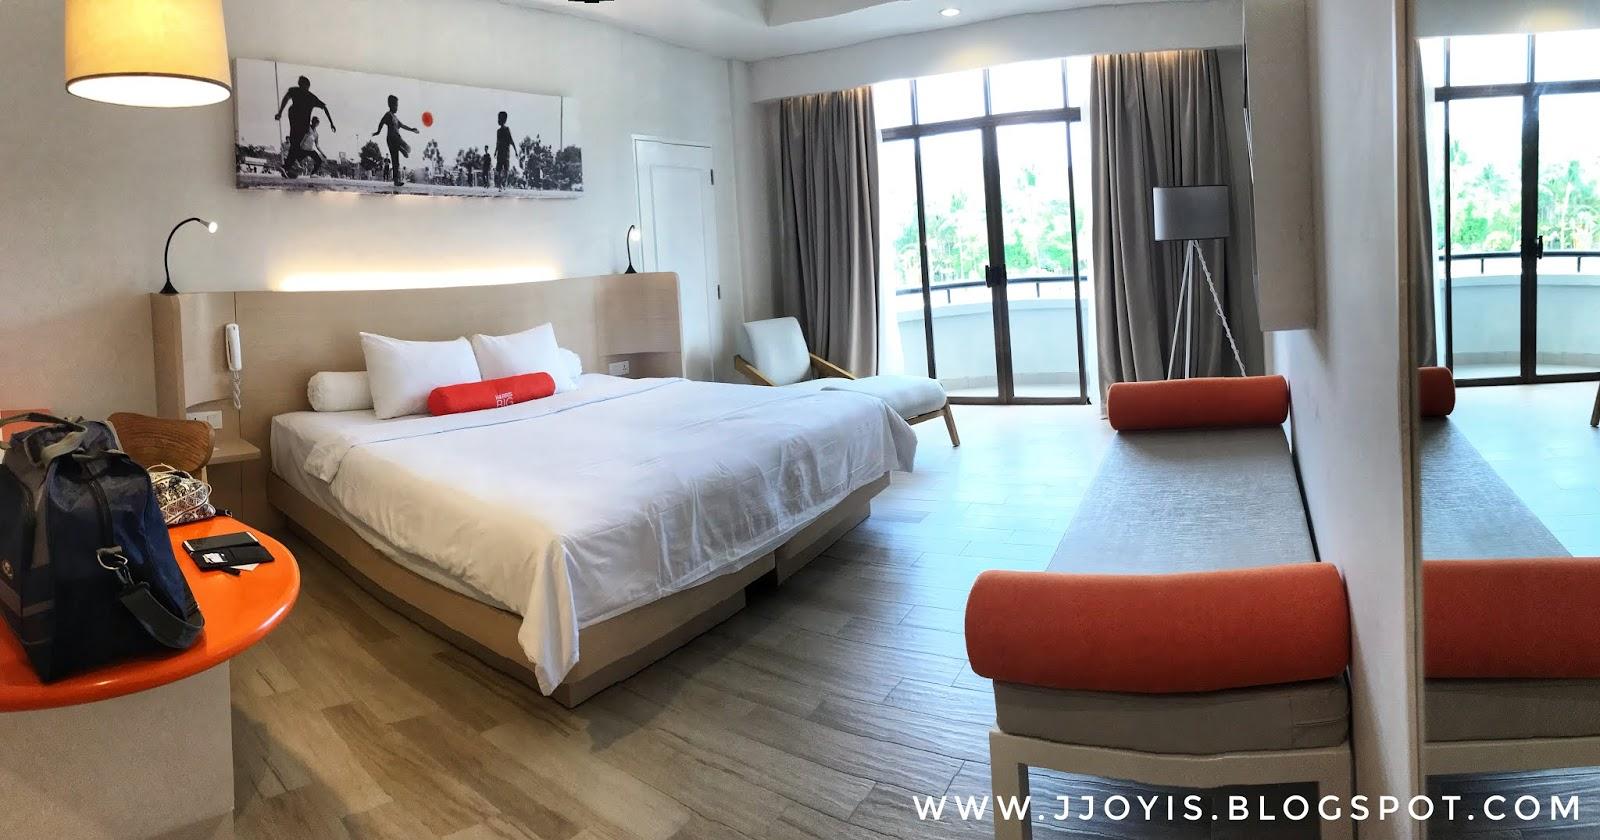 harris waterfront batam review room tour 2019 harris room family room'